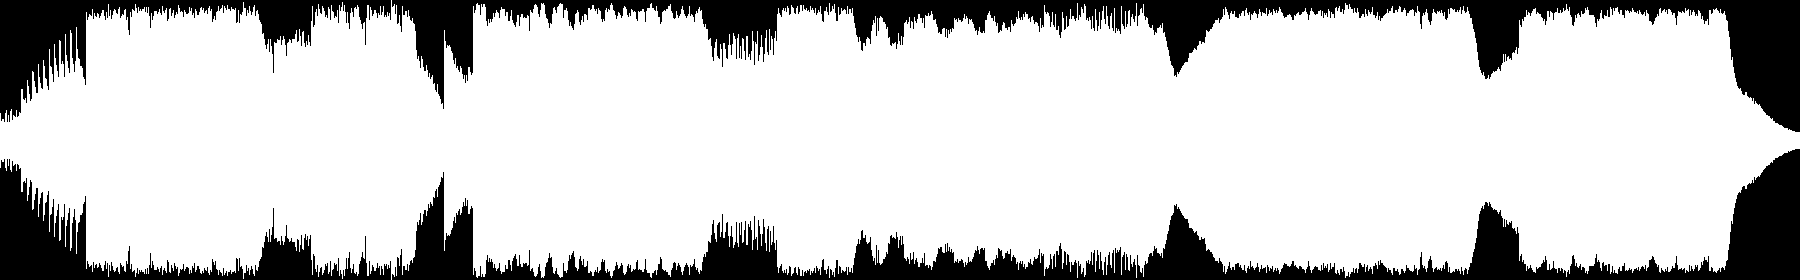 Disintegrate - Cinematic Ambient Loops audio waveform